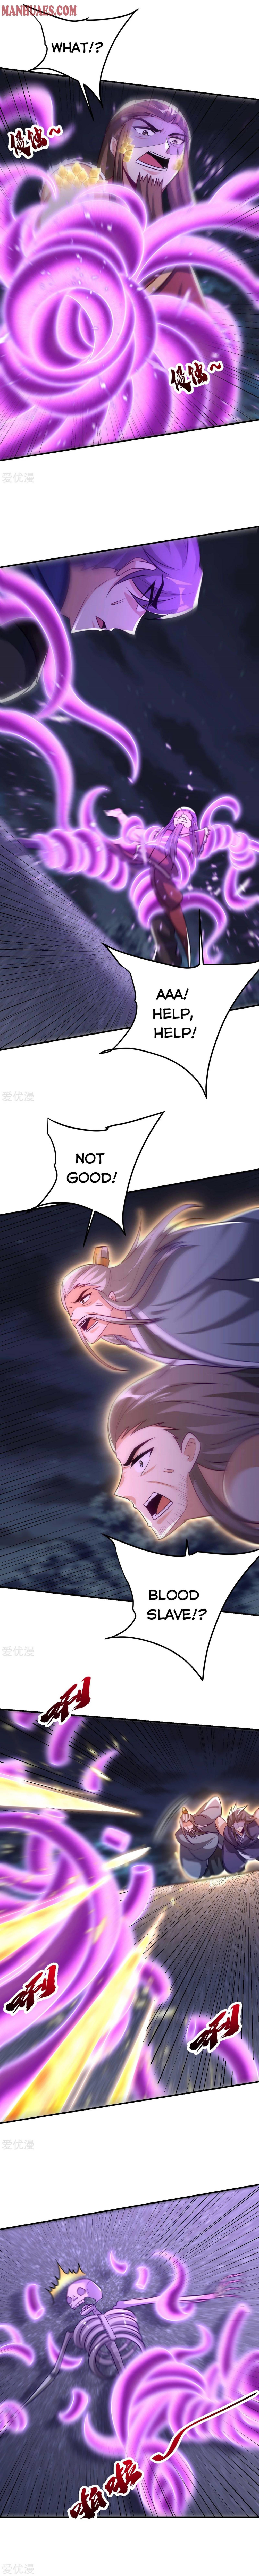 Rise Of The Demon King Chapter 210 page 6 - Mangakakalots.com